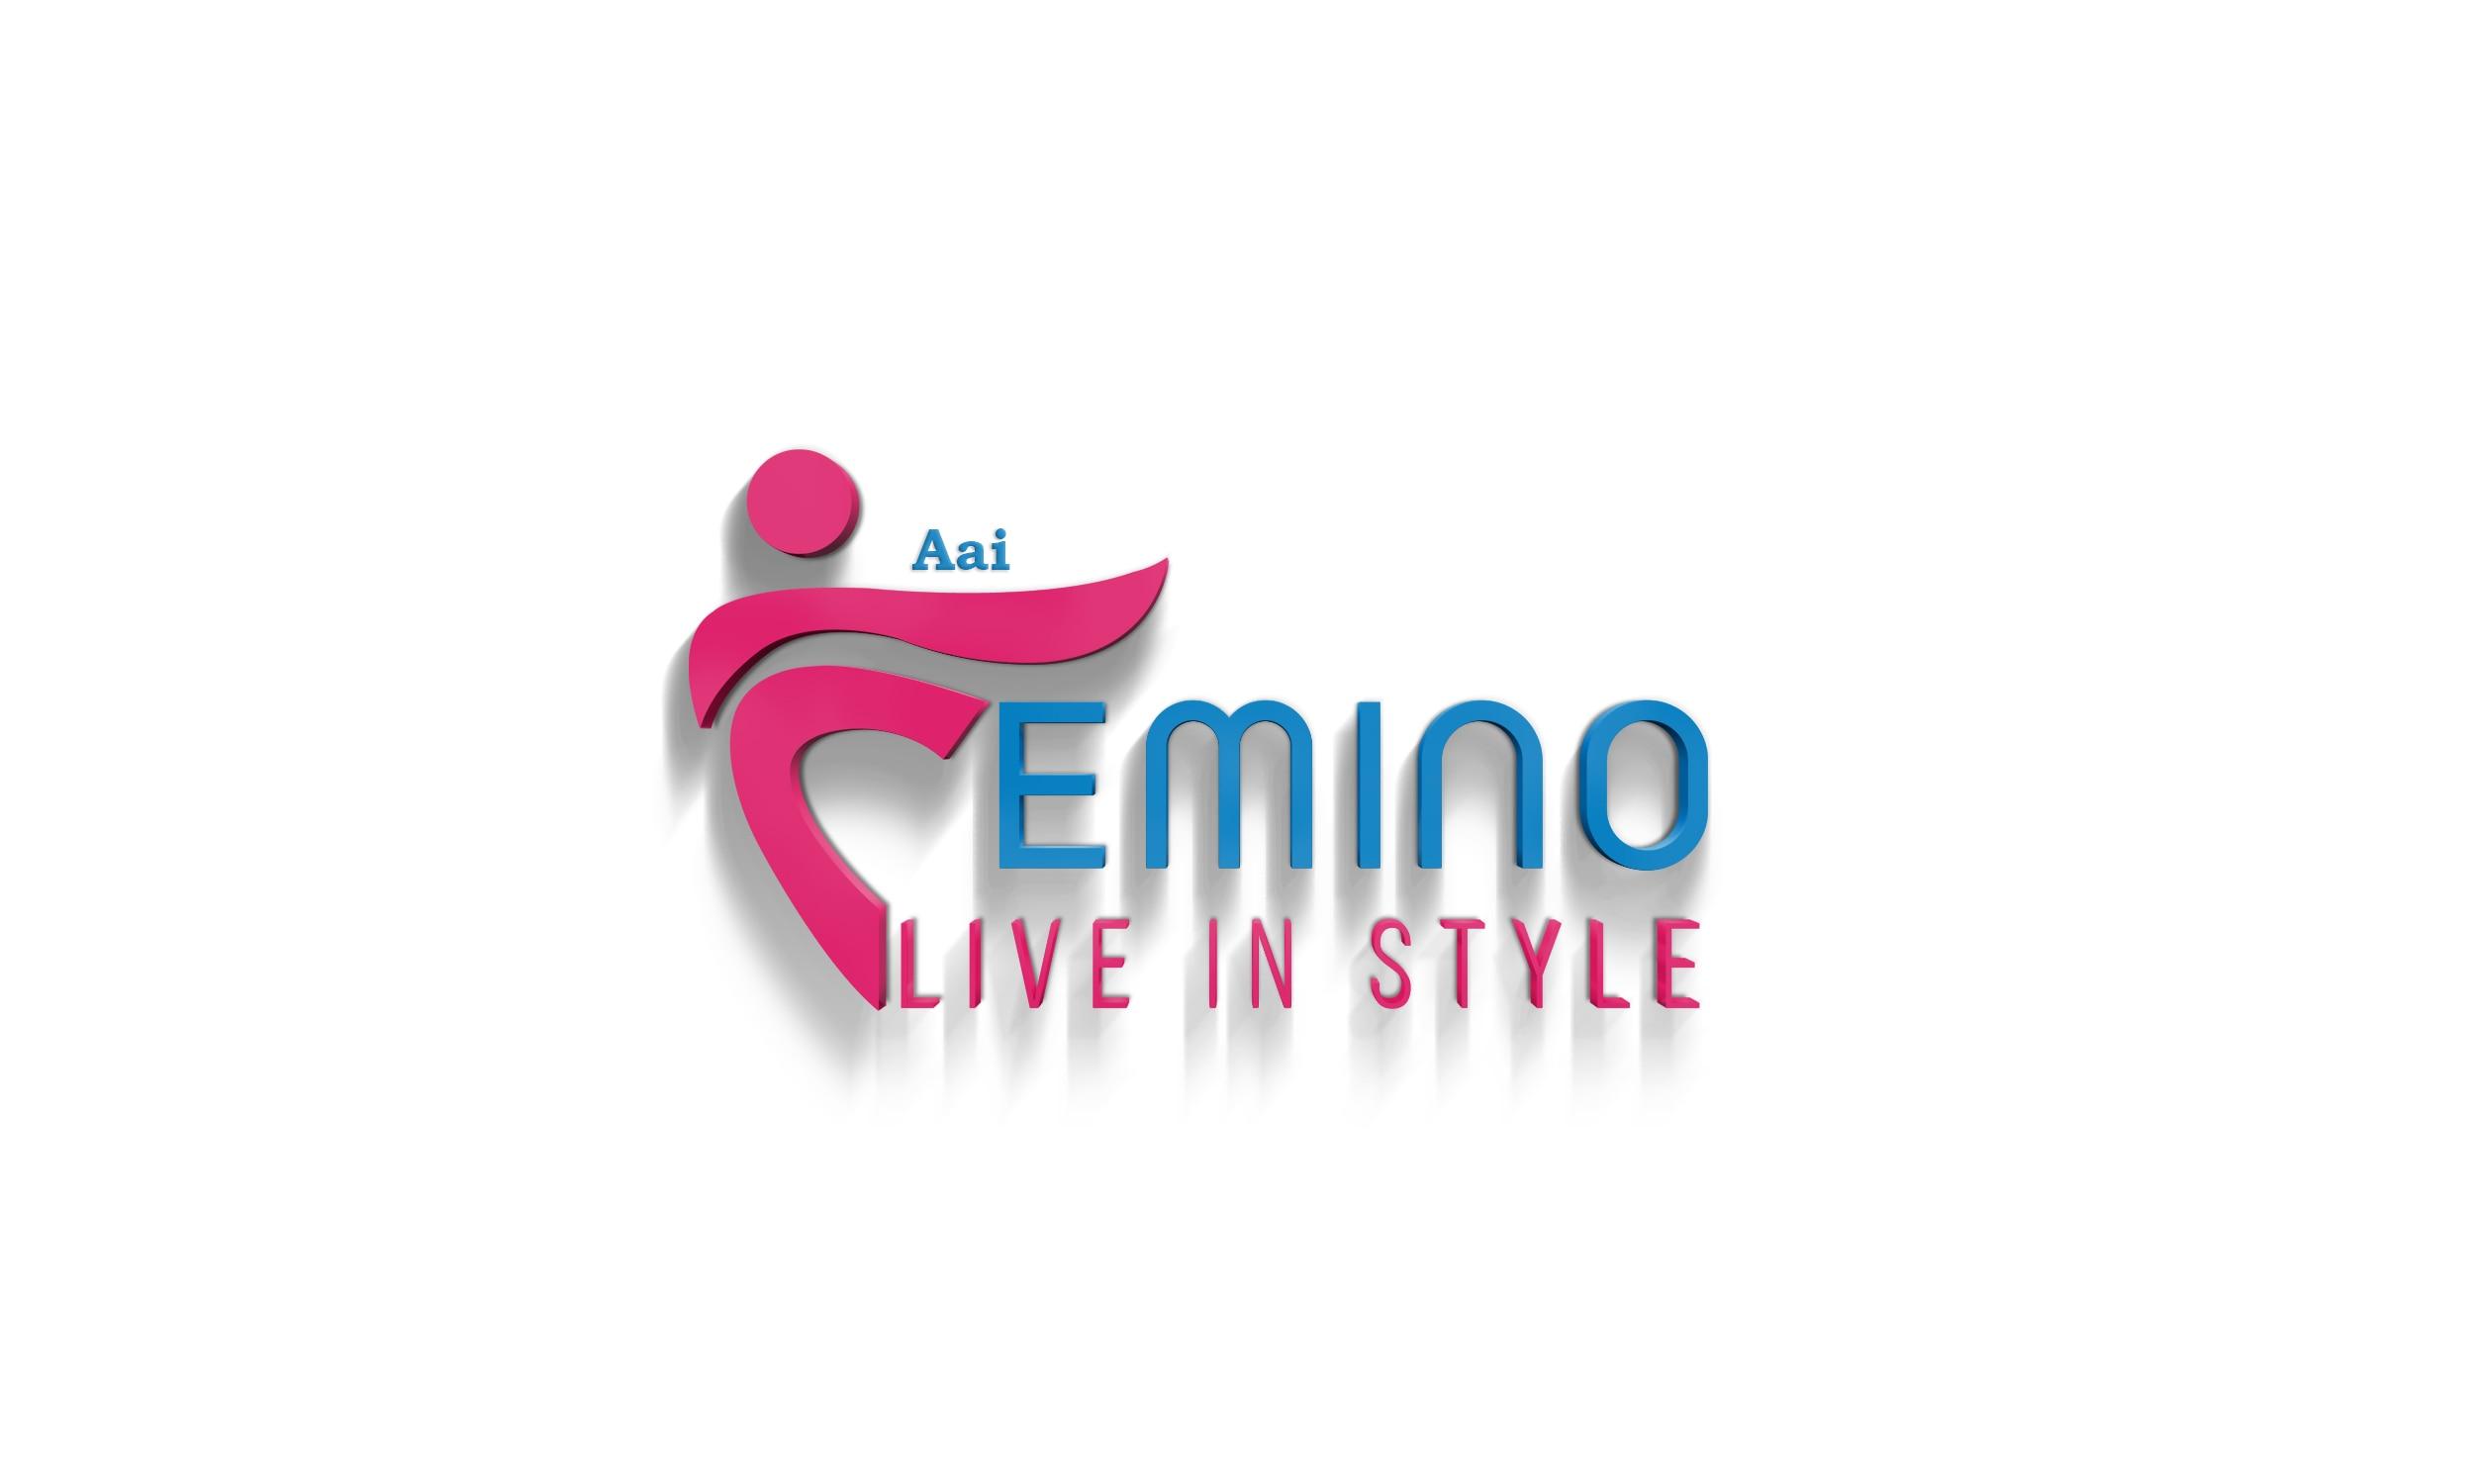 image of Aai Femino Fashion Designers